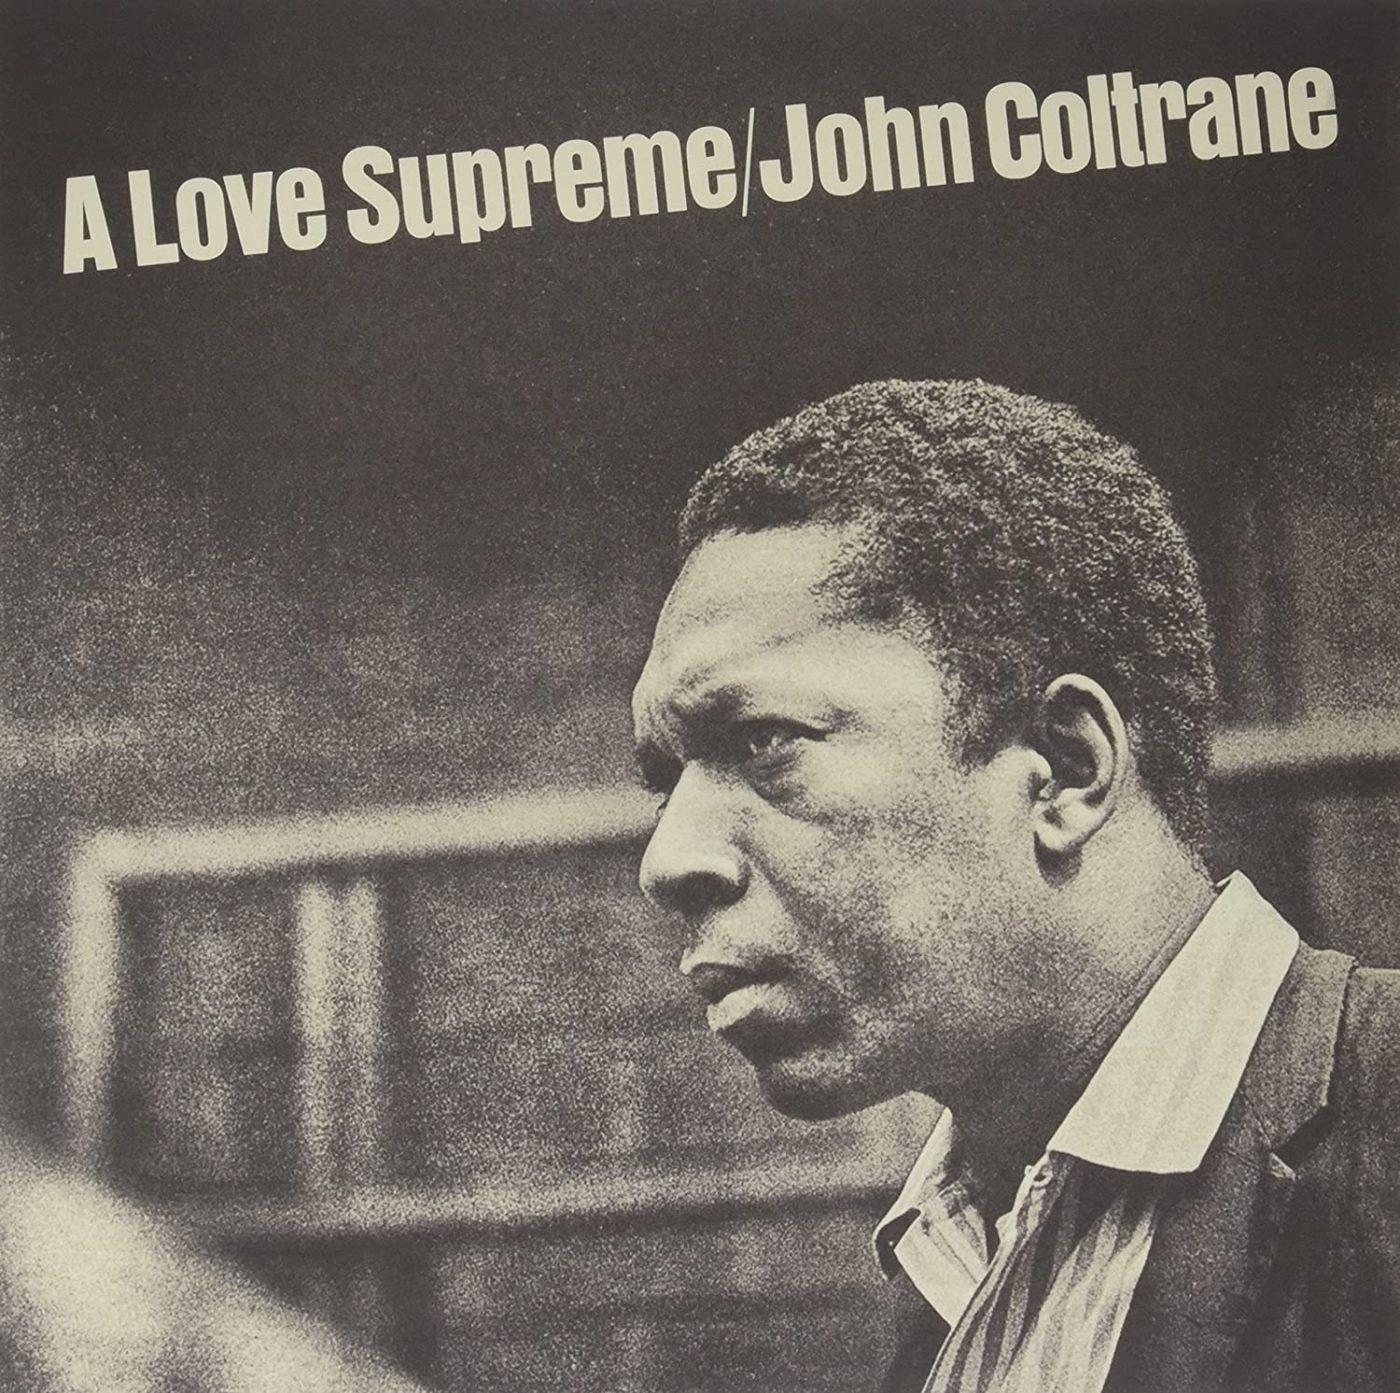 A-Love-Supreme-John-Coltrane-cover-1400x1393, Keith LaMar: A Love Supreme, Behind Enemy Lines